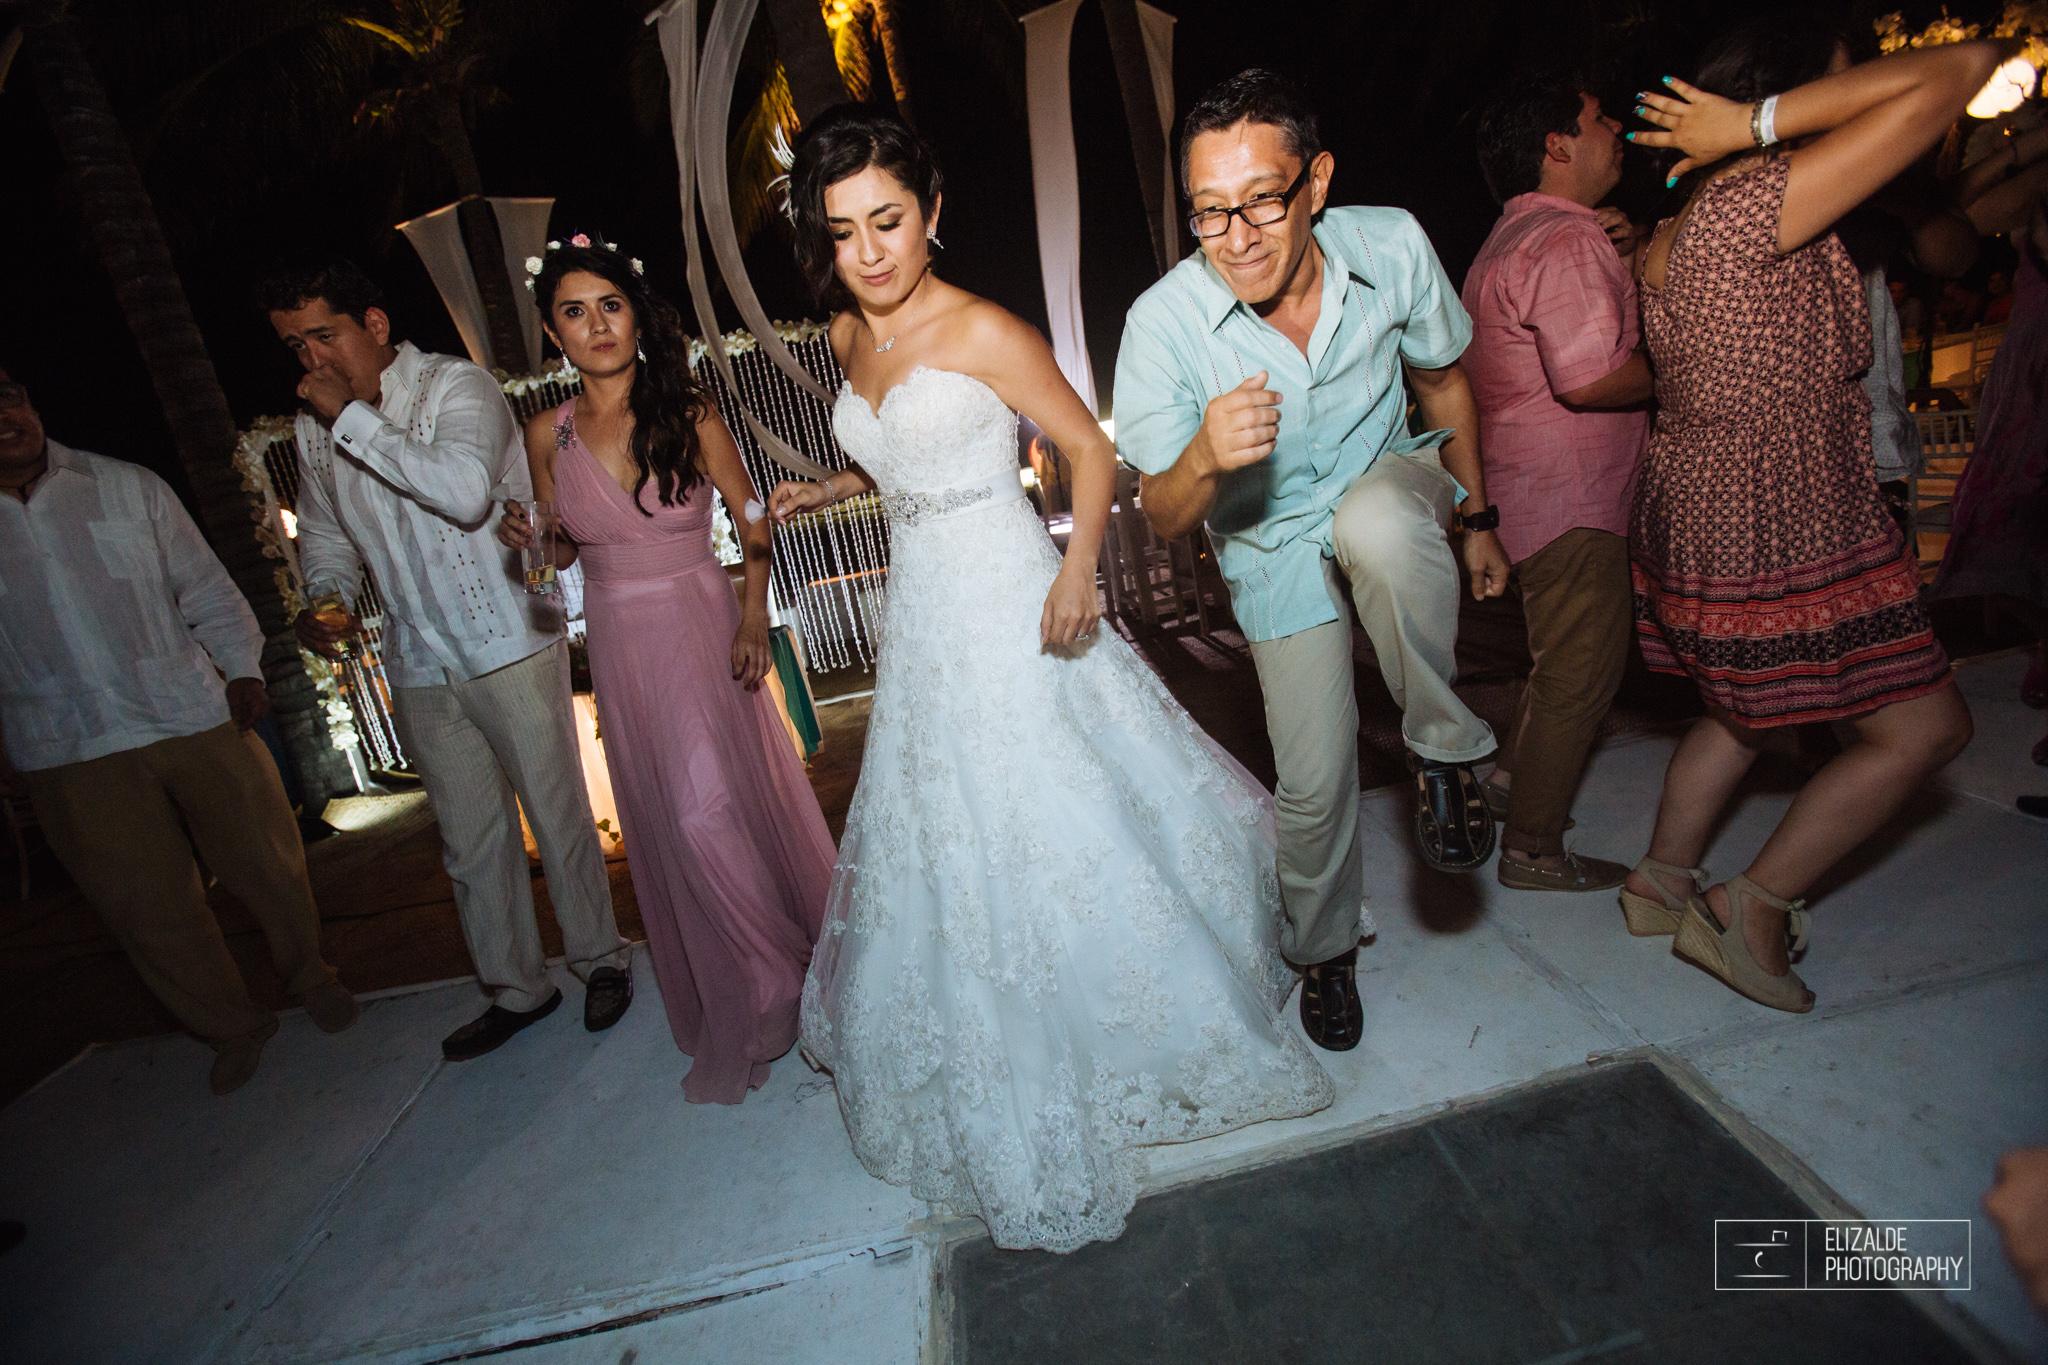 Pay and Ferran_Acapulco_Destination Wedding_Elizalde Photography-133.jpg